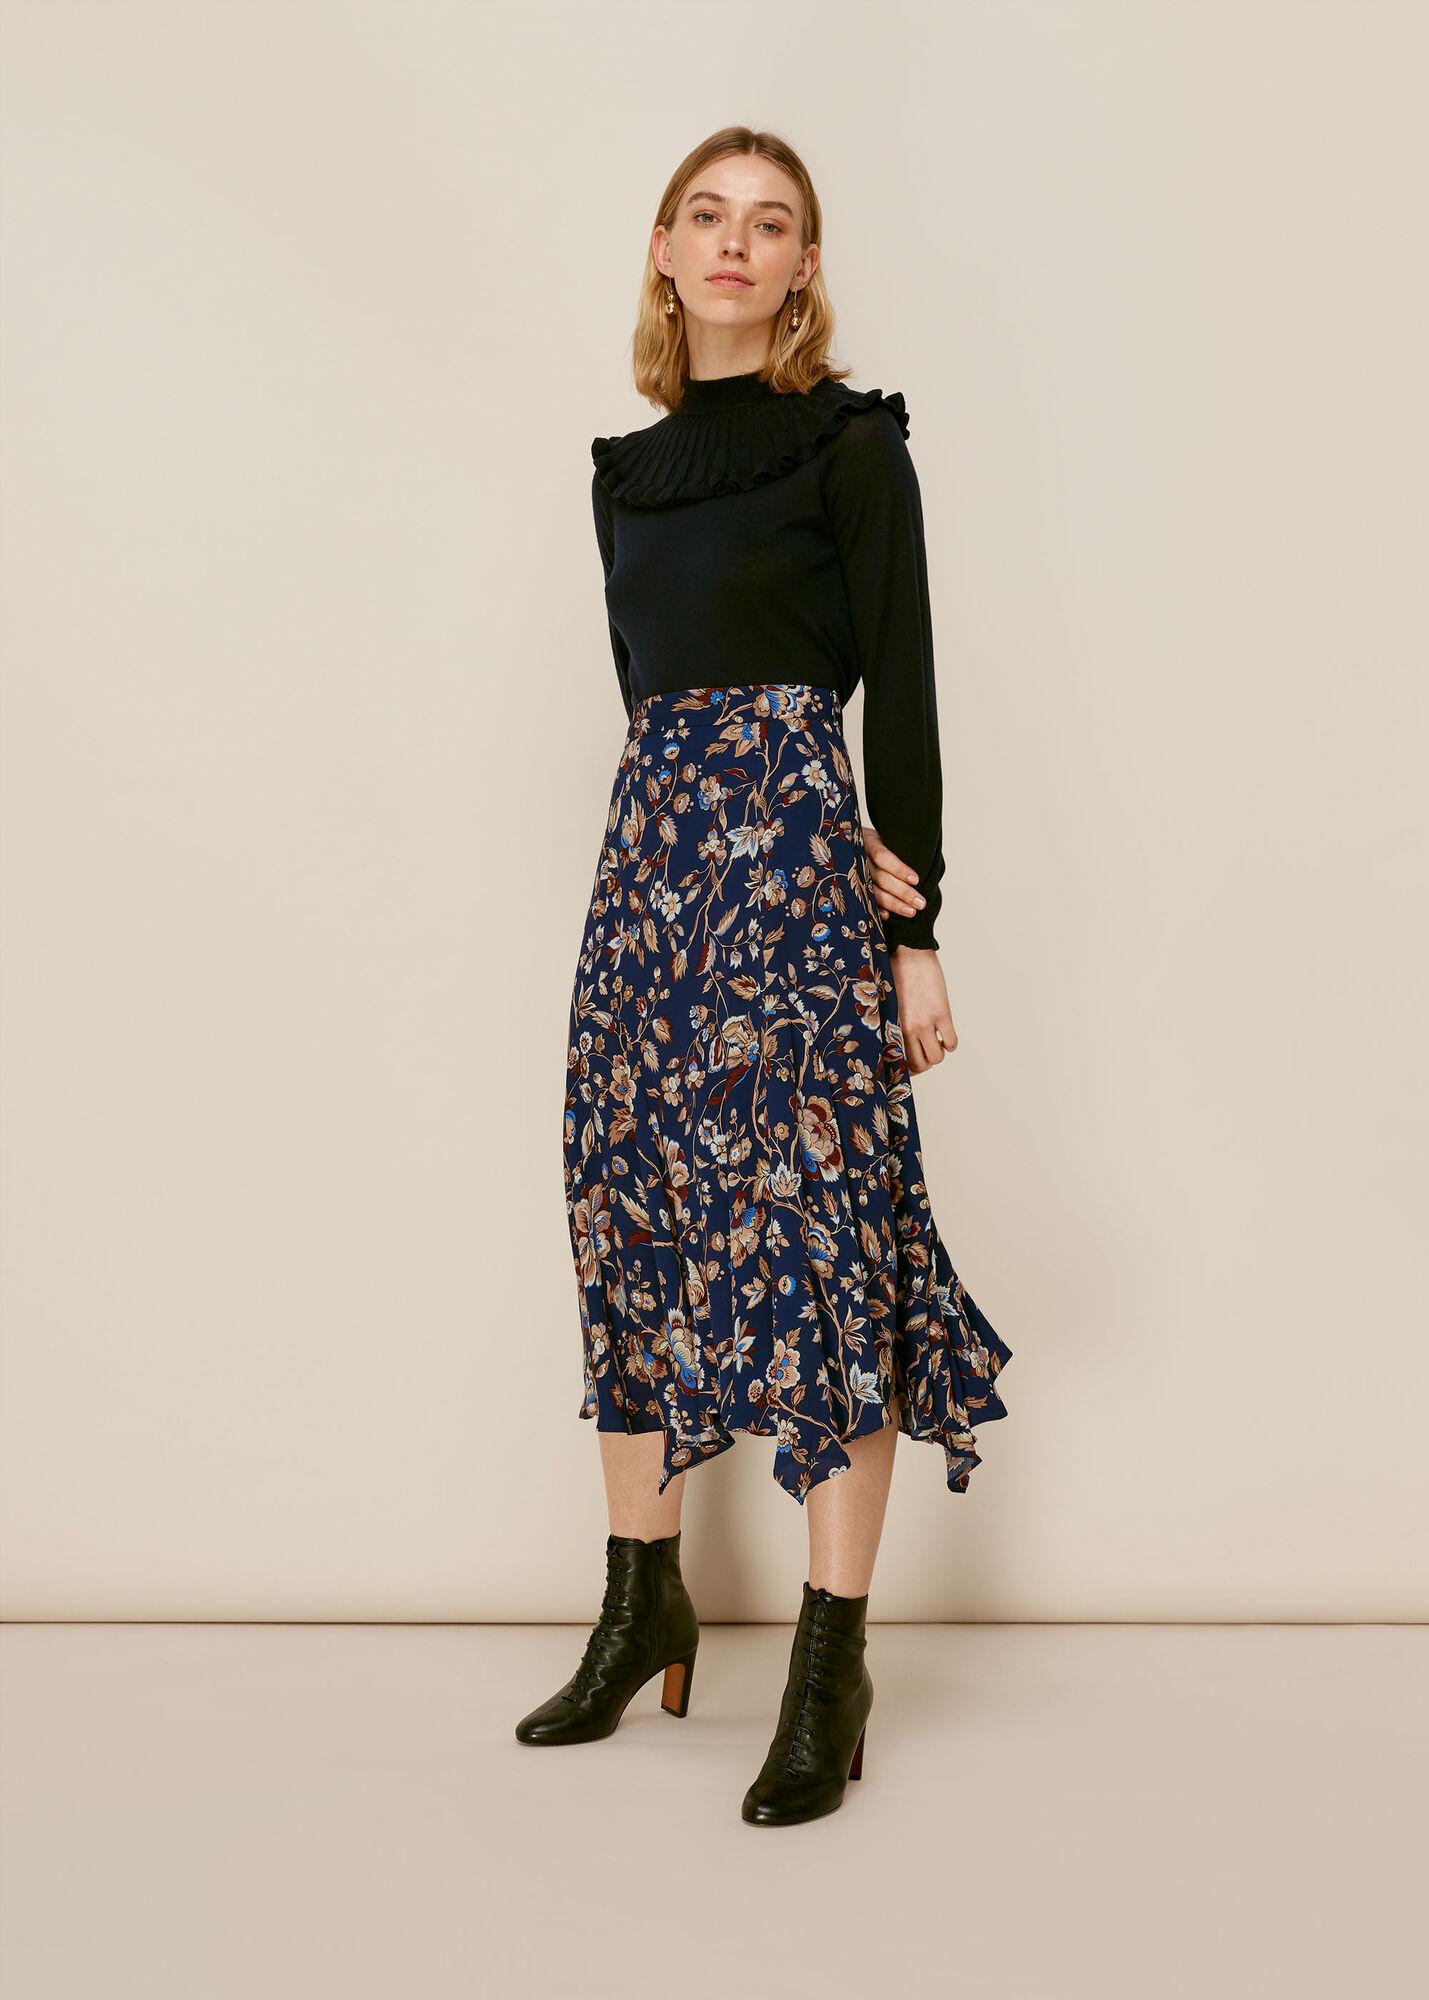 Prairie Blossom Print Skirt